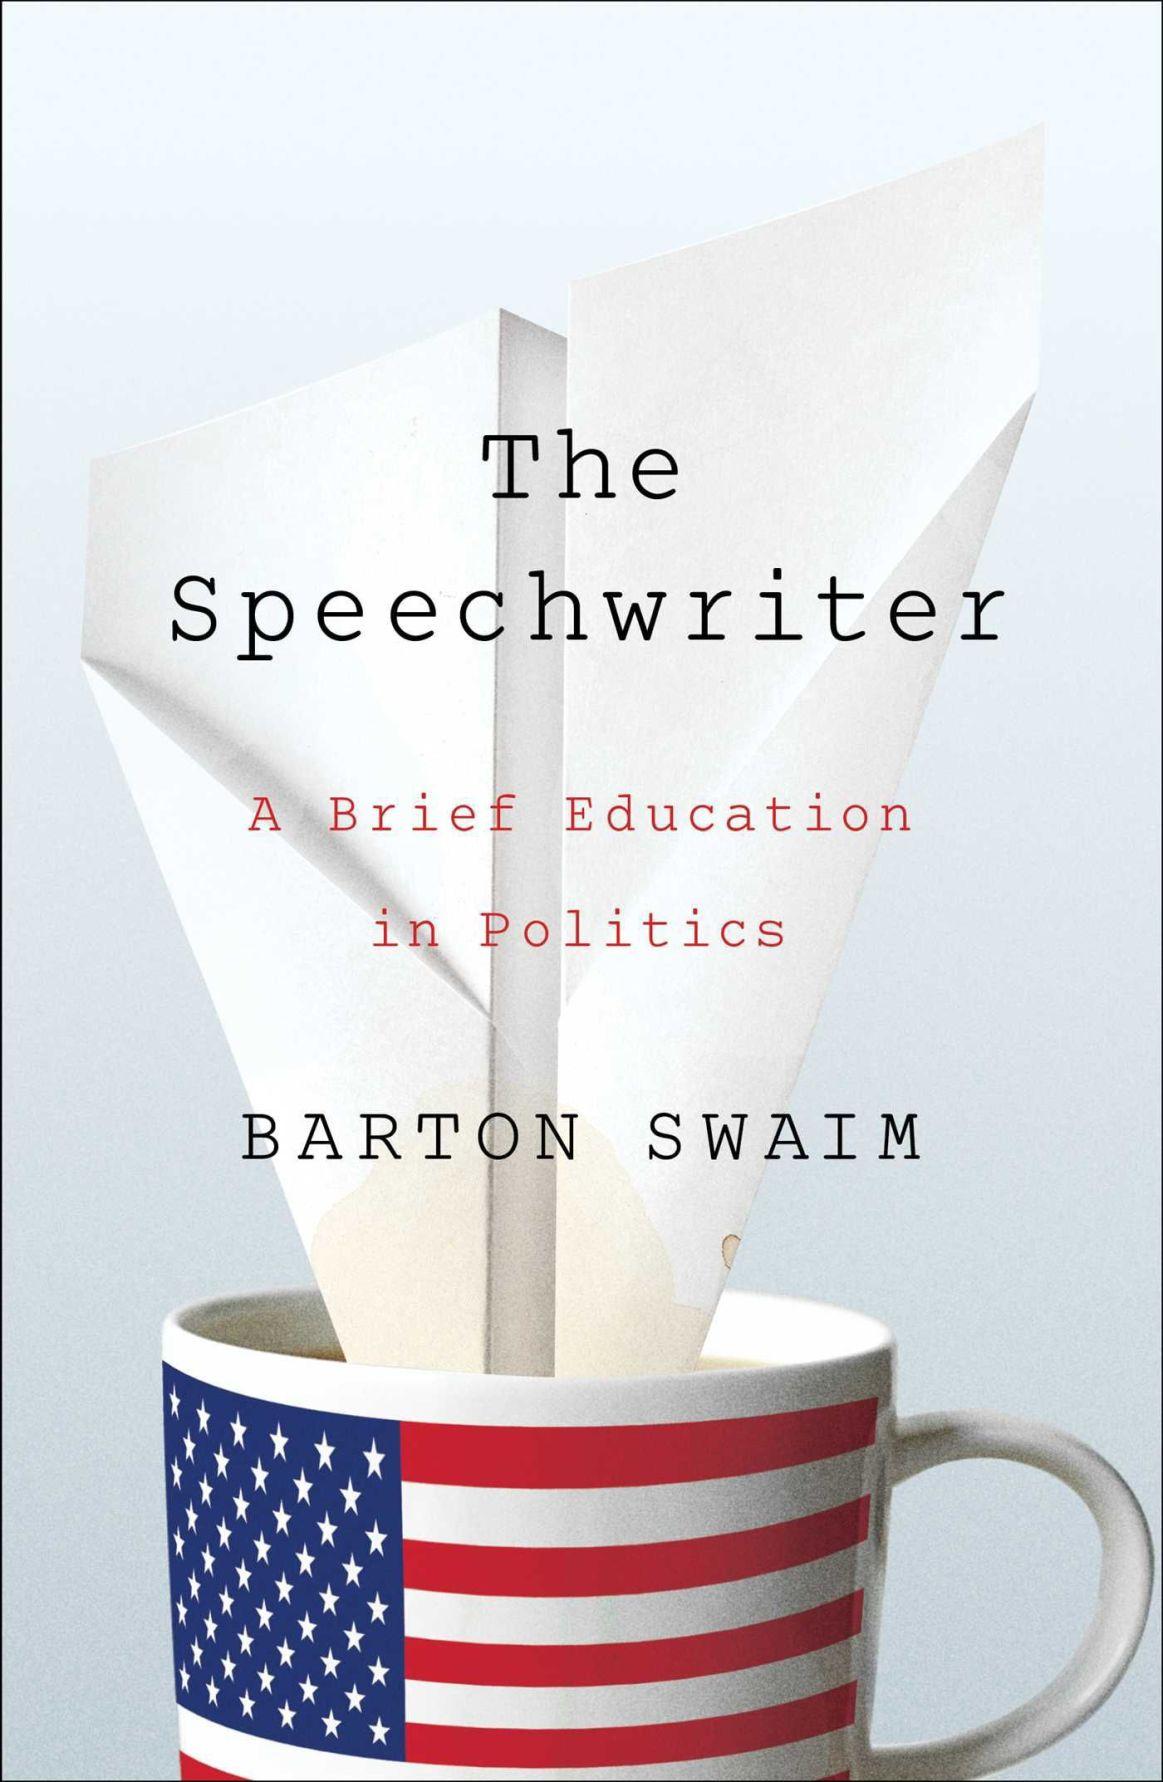 Ex-governor's 'Speechwriter' tells all